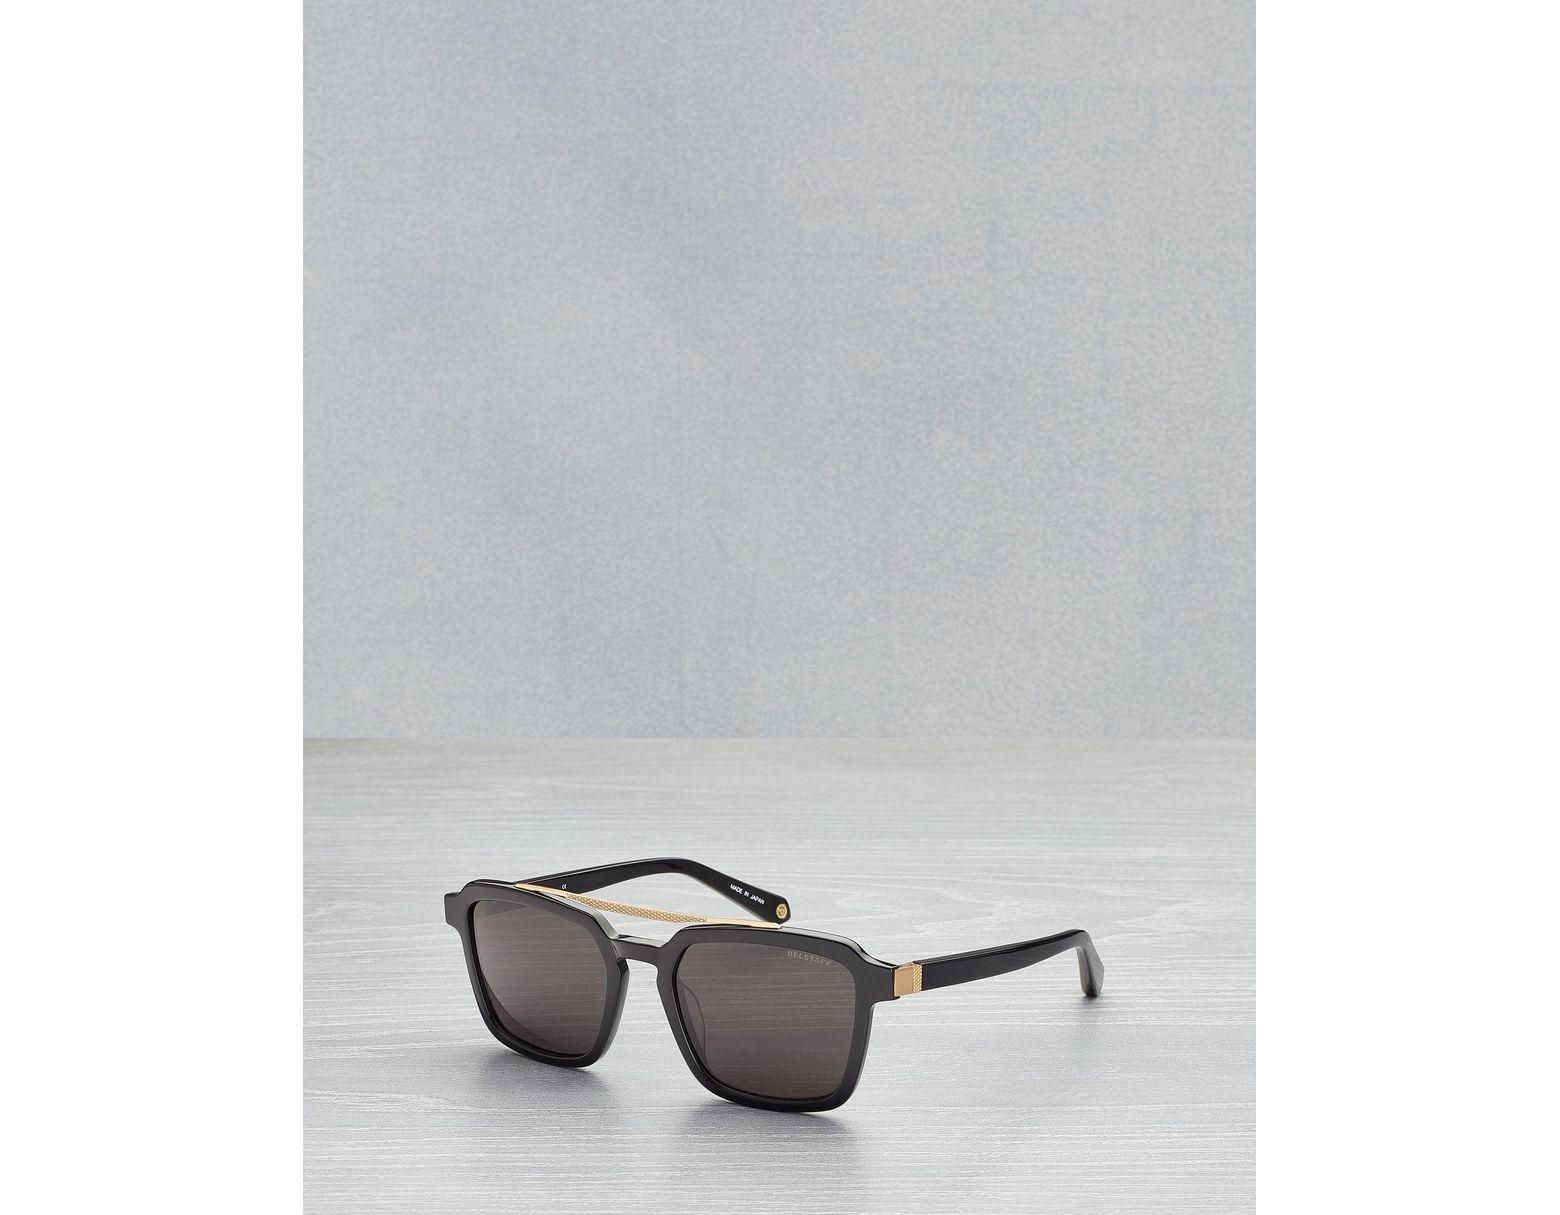 8b4f420940 Belstaff Cassel 18 Sunglasses for Men - Lyst